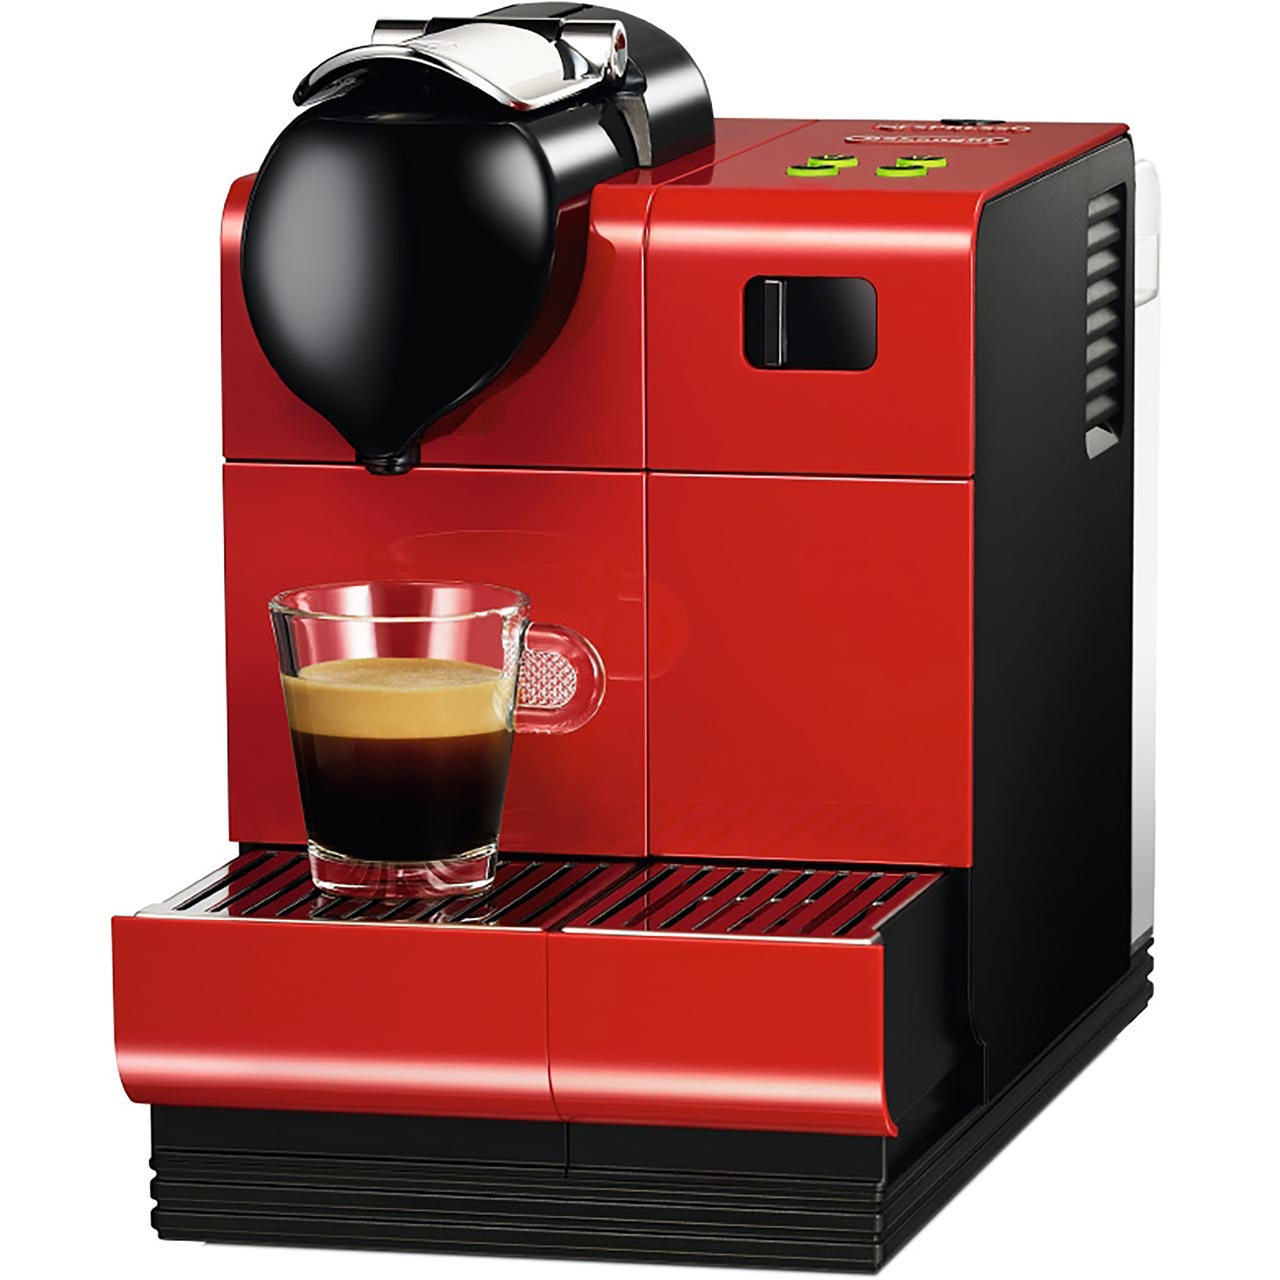 nespresso by de 39 longhi en521 r lattissima coffee machine free 75 nespresso club voucher. Black Bedroom Furniture Sets. Home Design Ideas